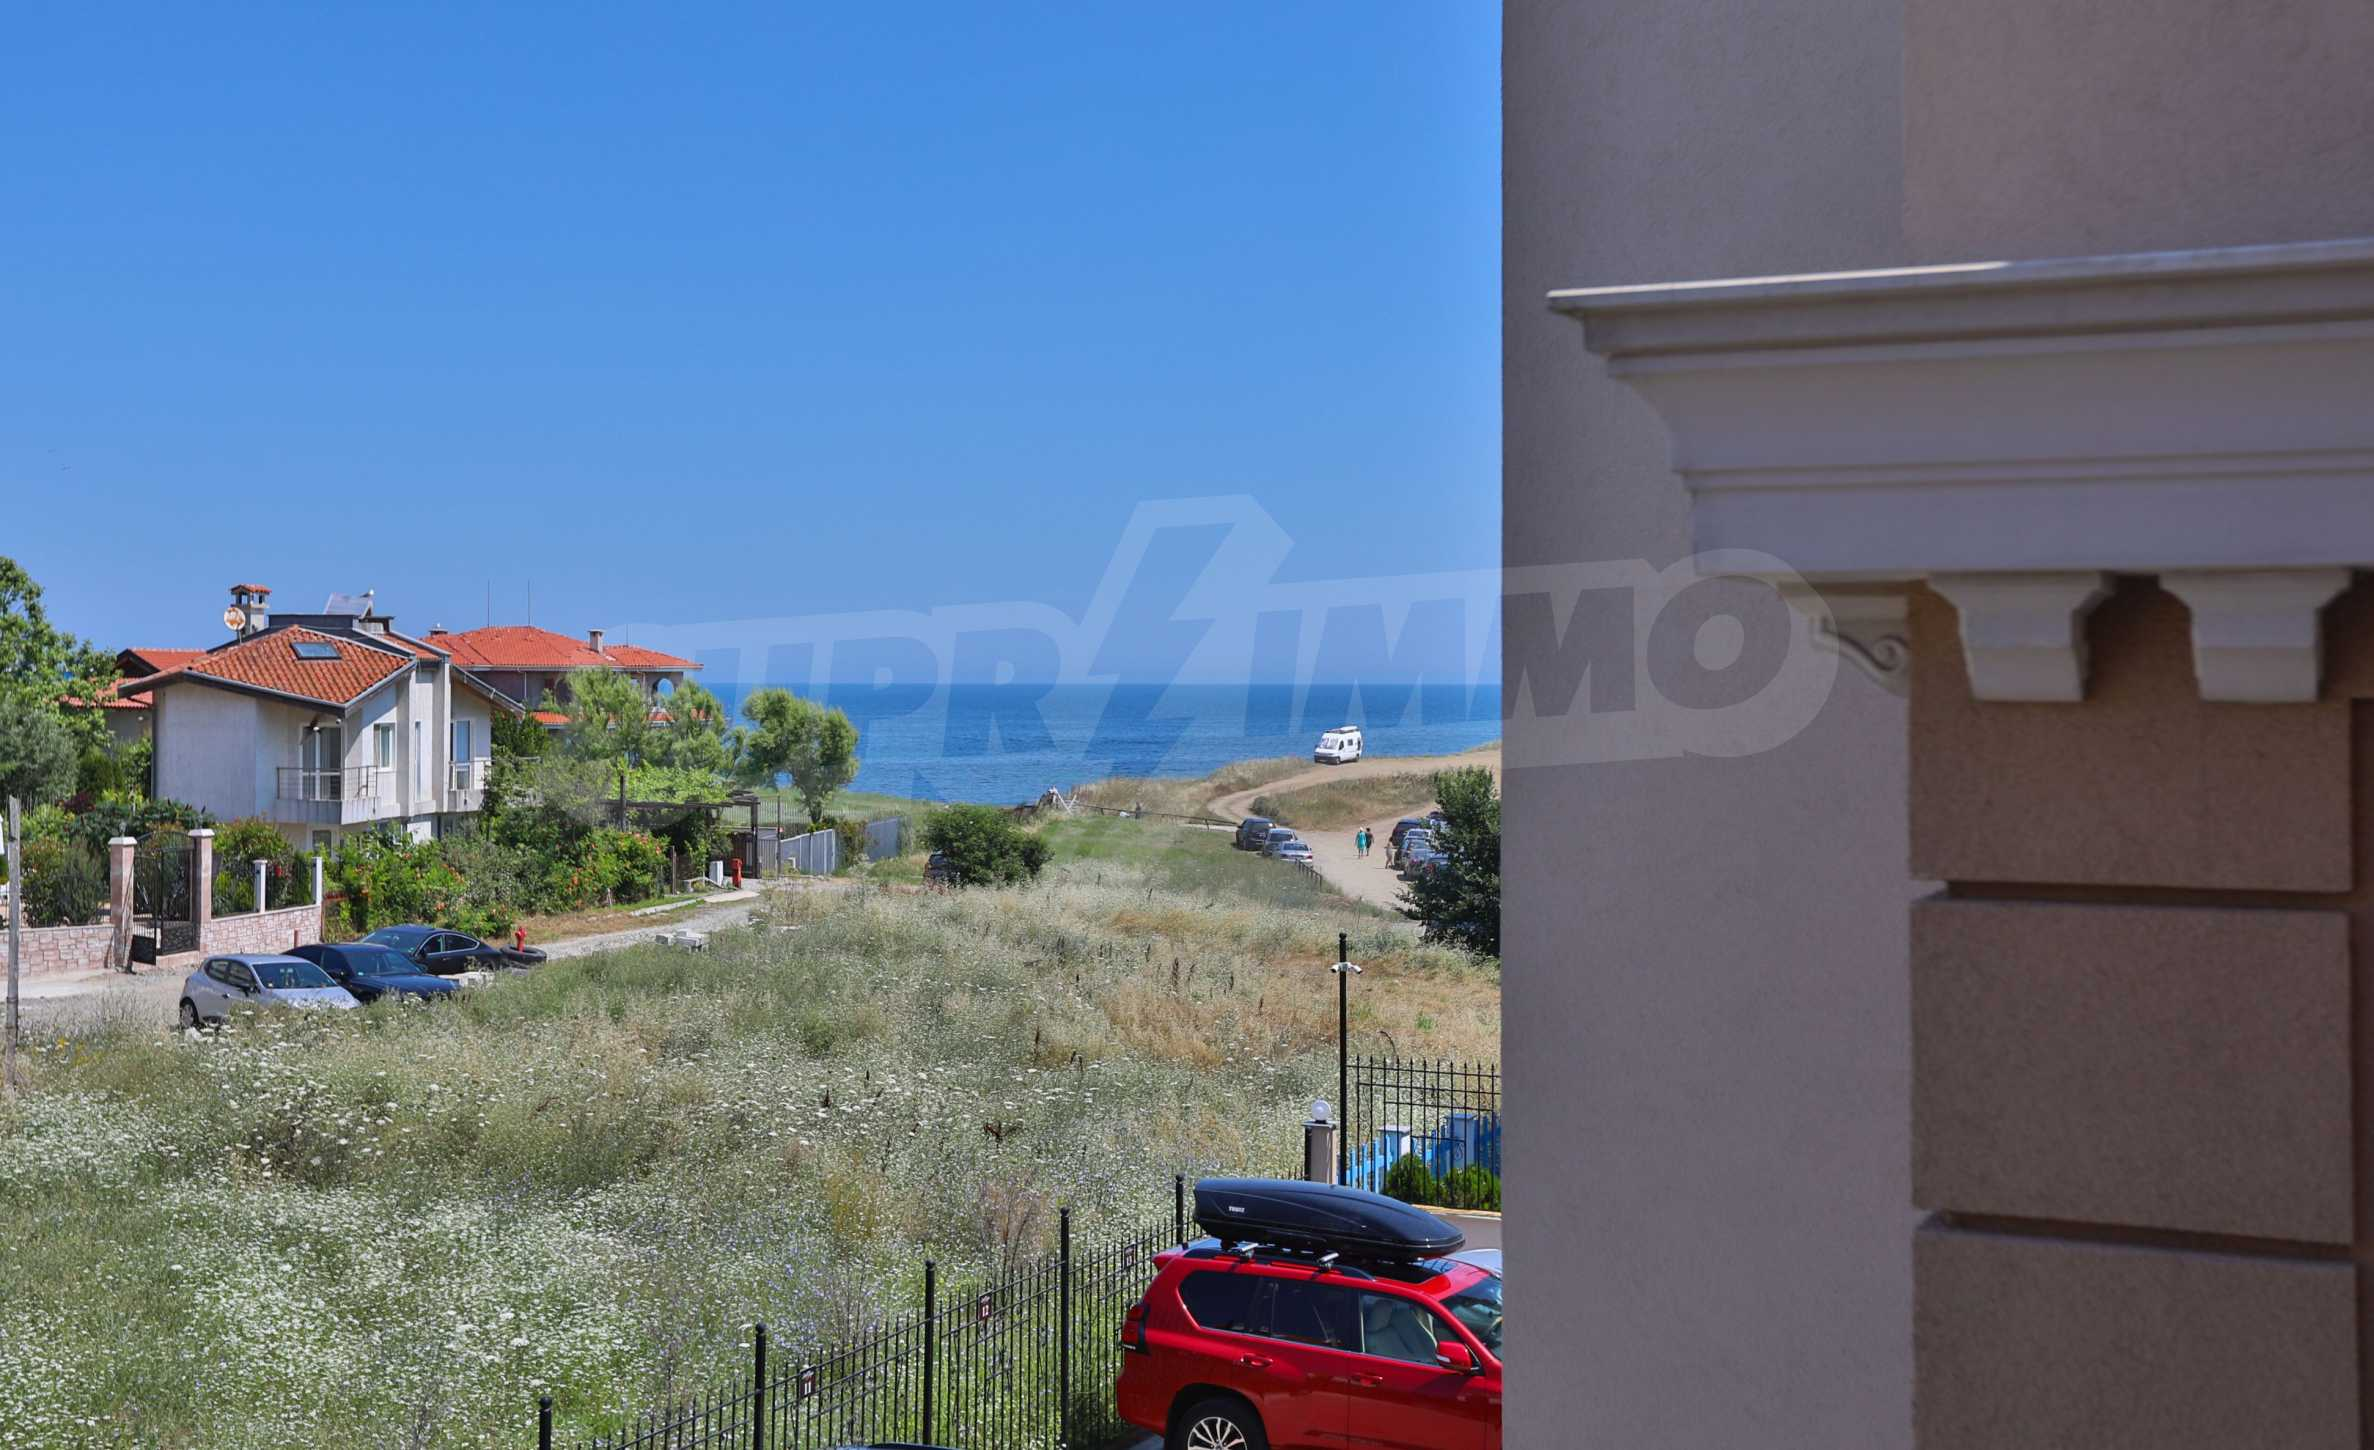 Първокласен двустаен апартамент в Belle Époque Beach Residence (ап. №A 206) 9